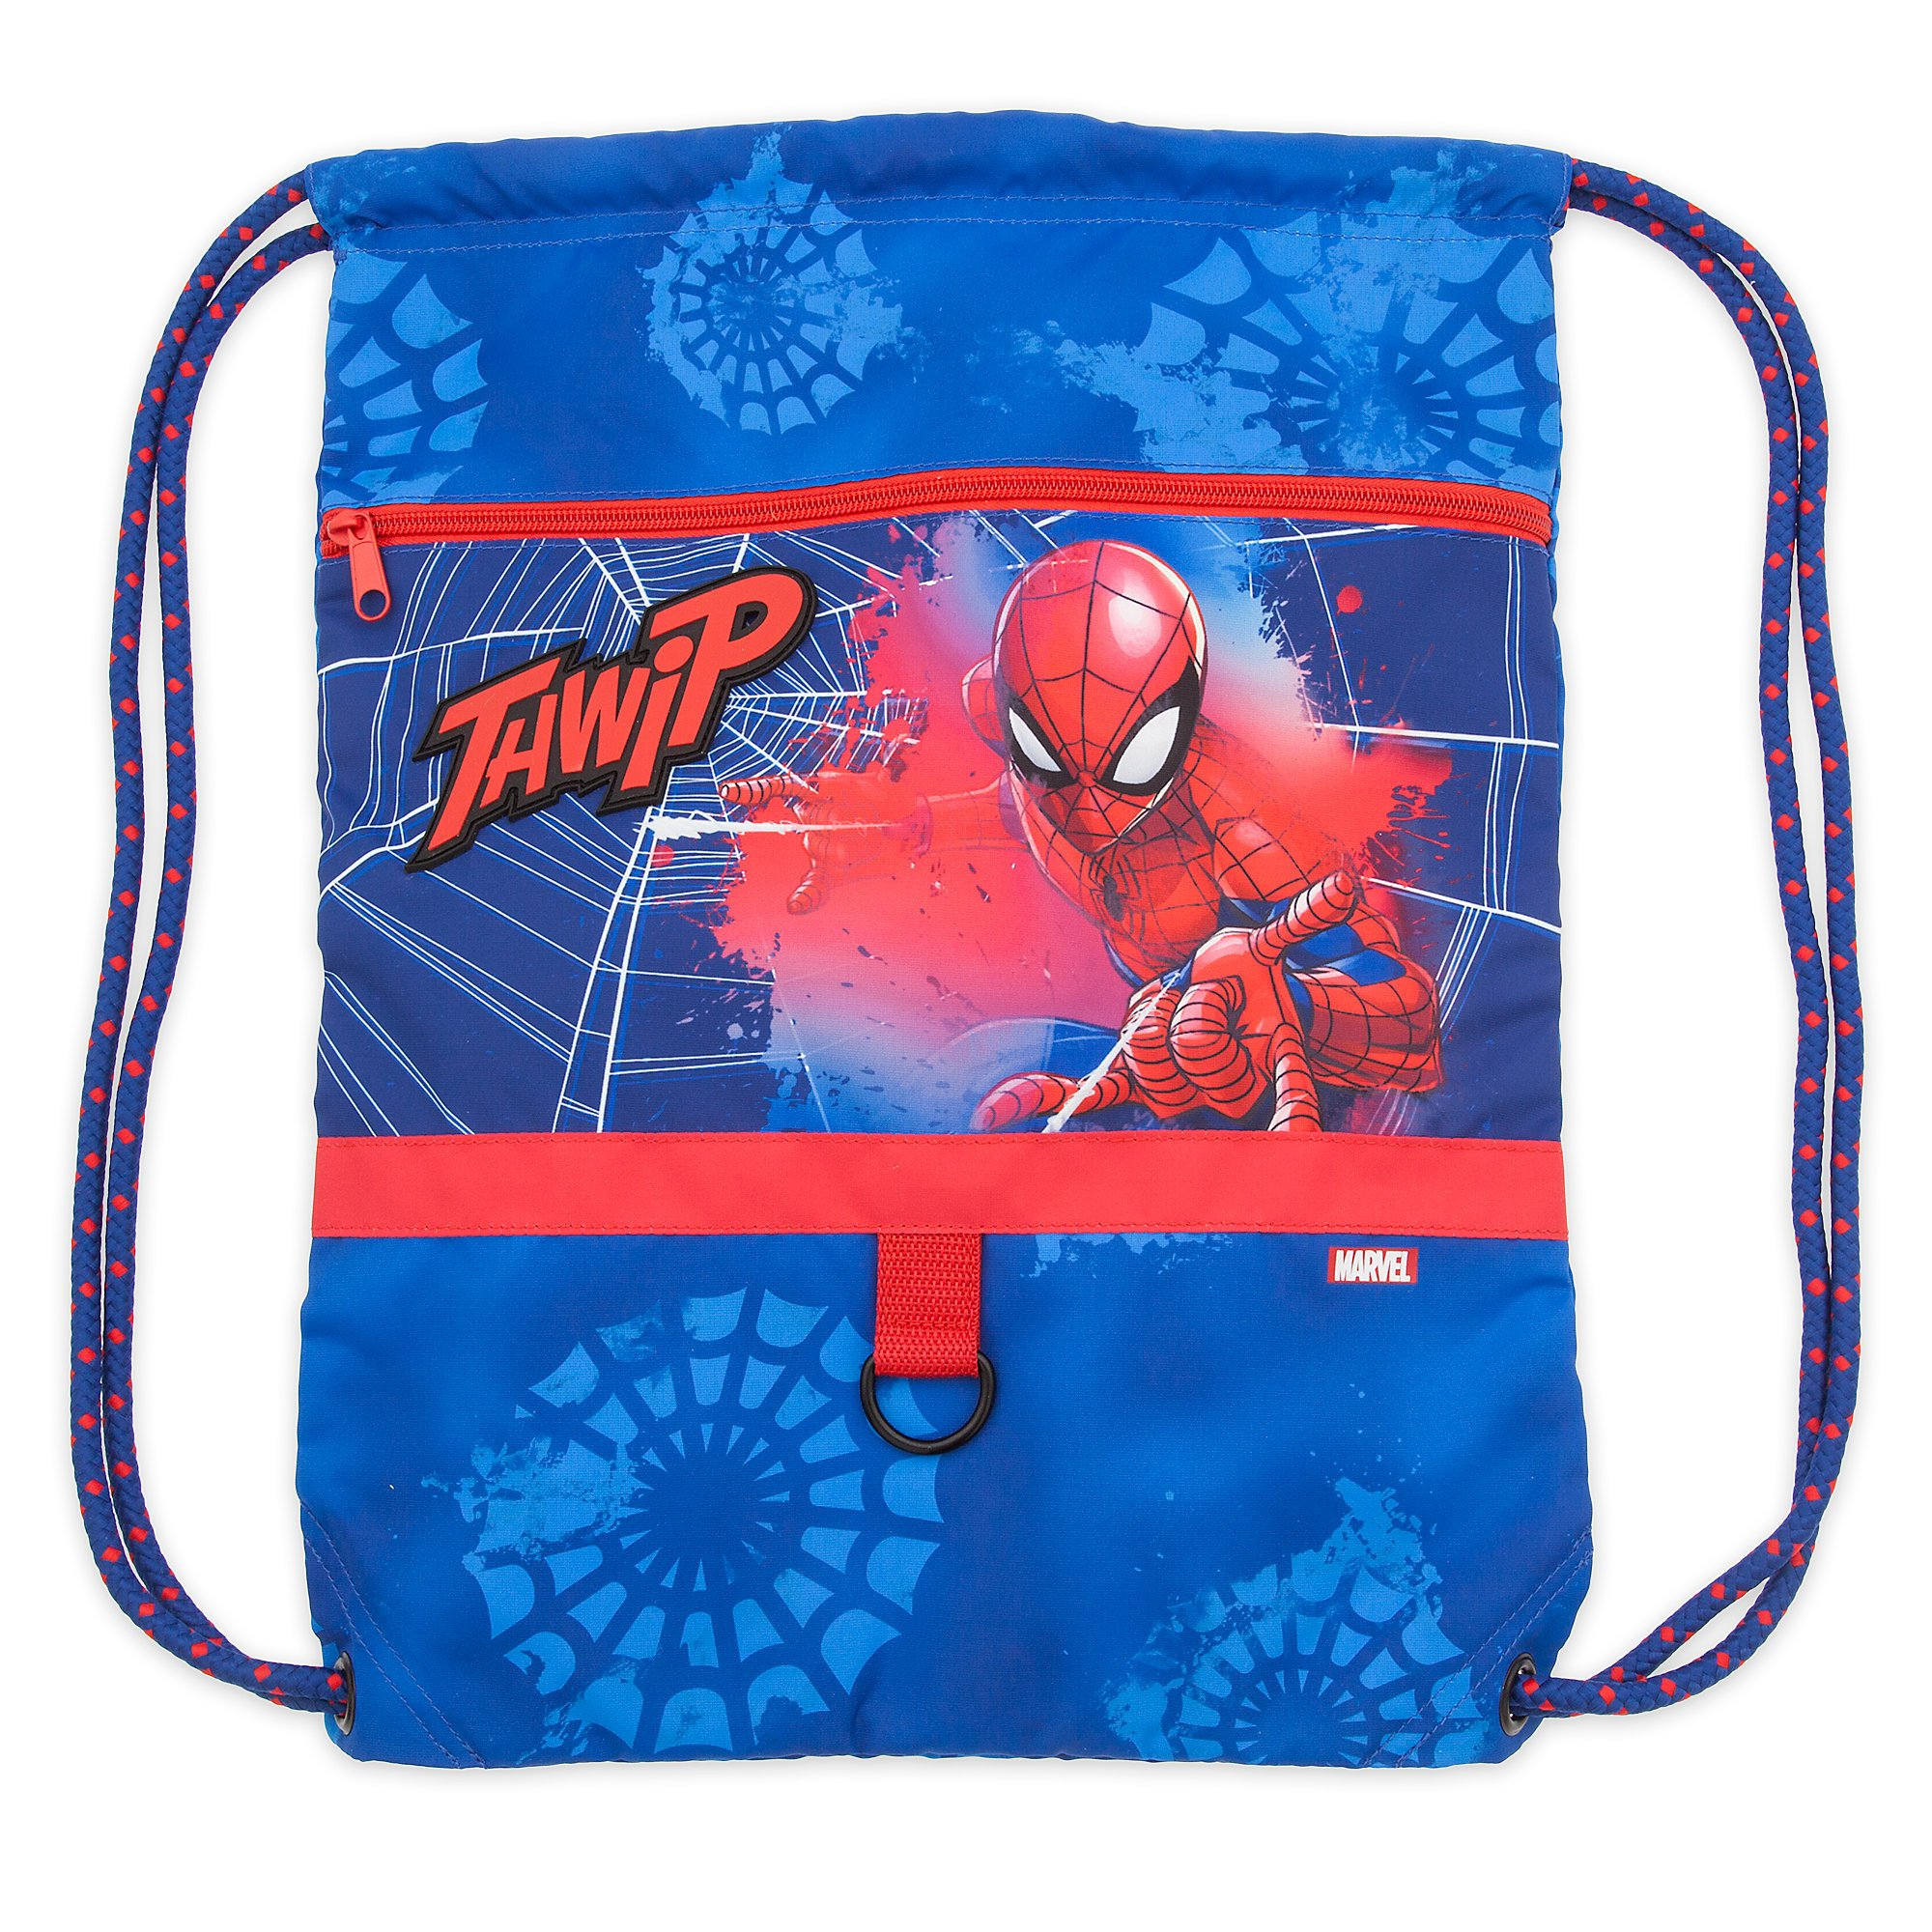 Disney Spider-Man Swim Bag for Kids w zipper Pocket and Cinch Top Closure